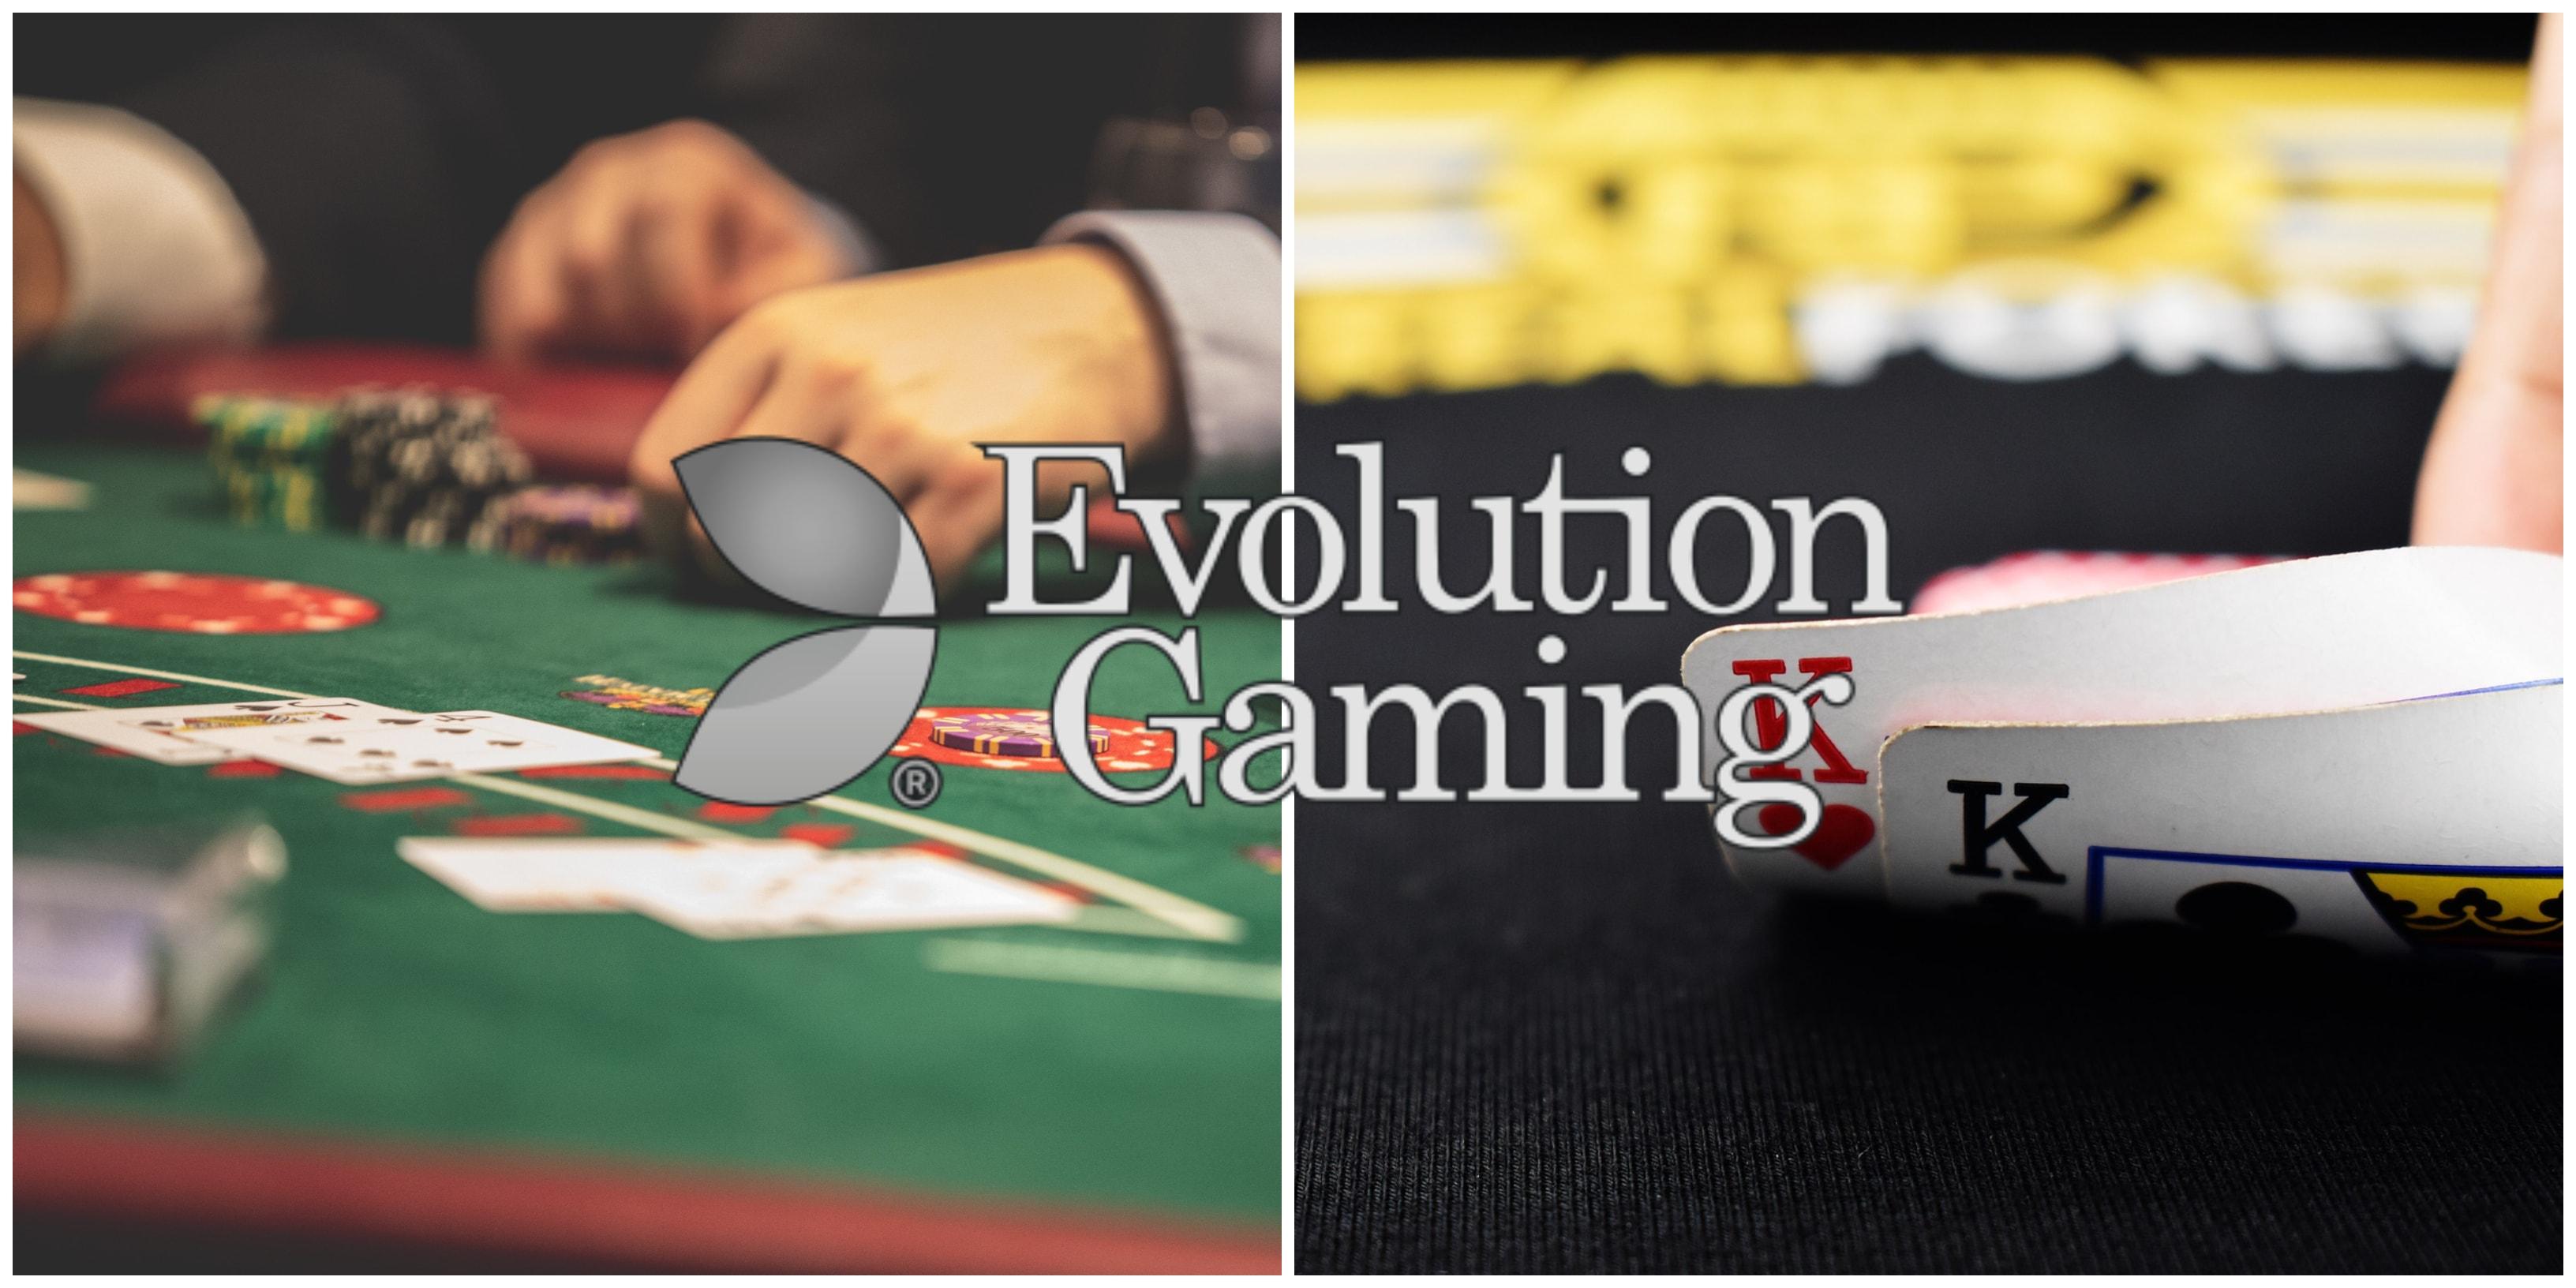 Free Bet Blackjack And 2 Hand Hold Em Released By Evolution